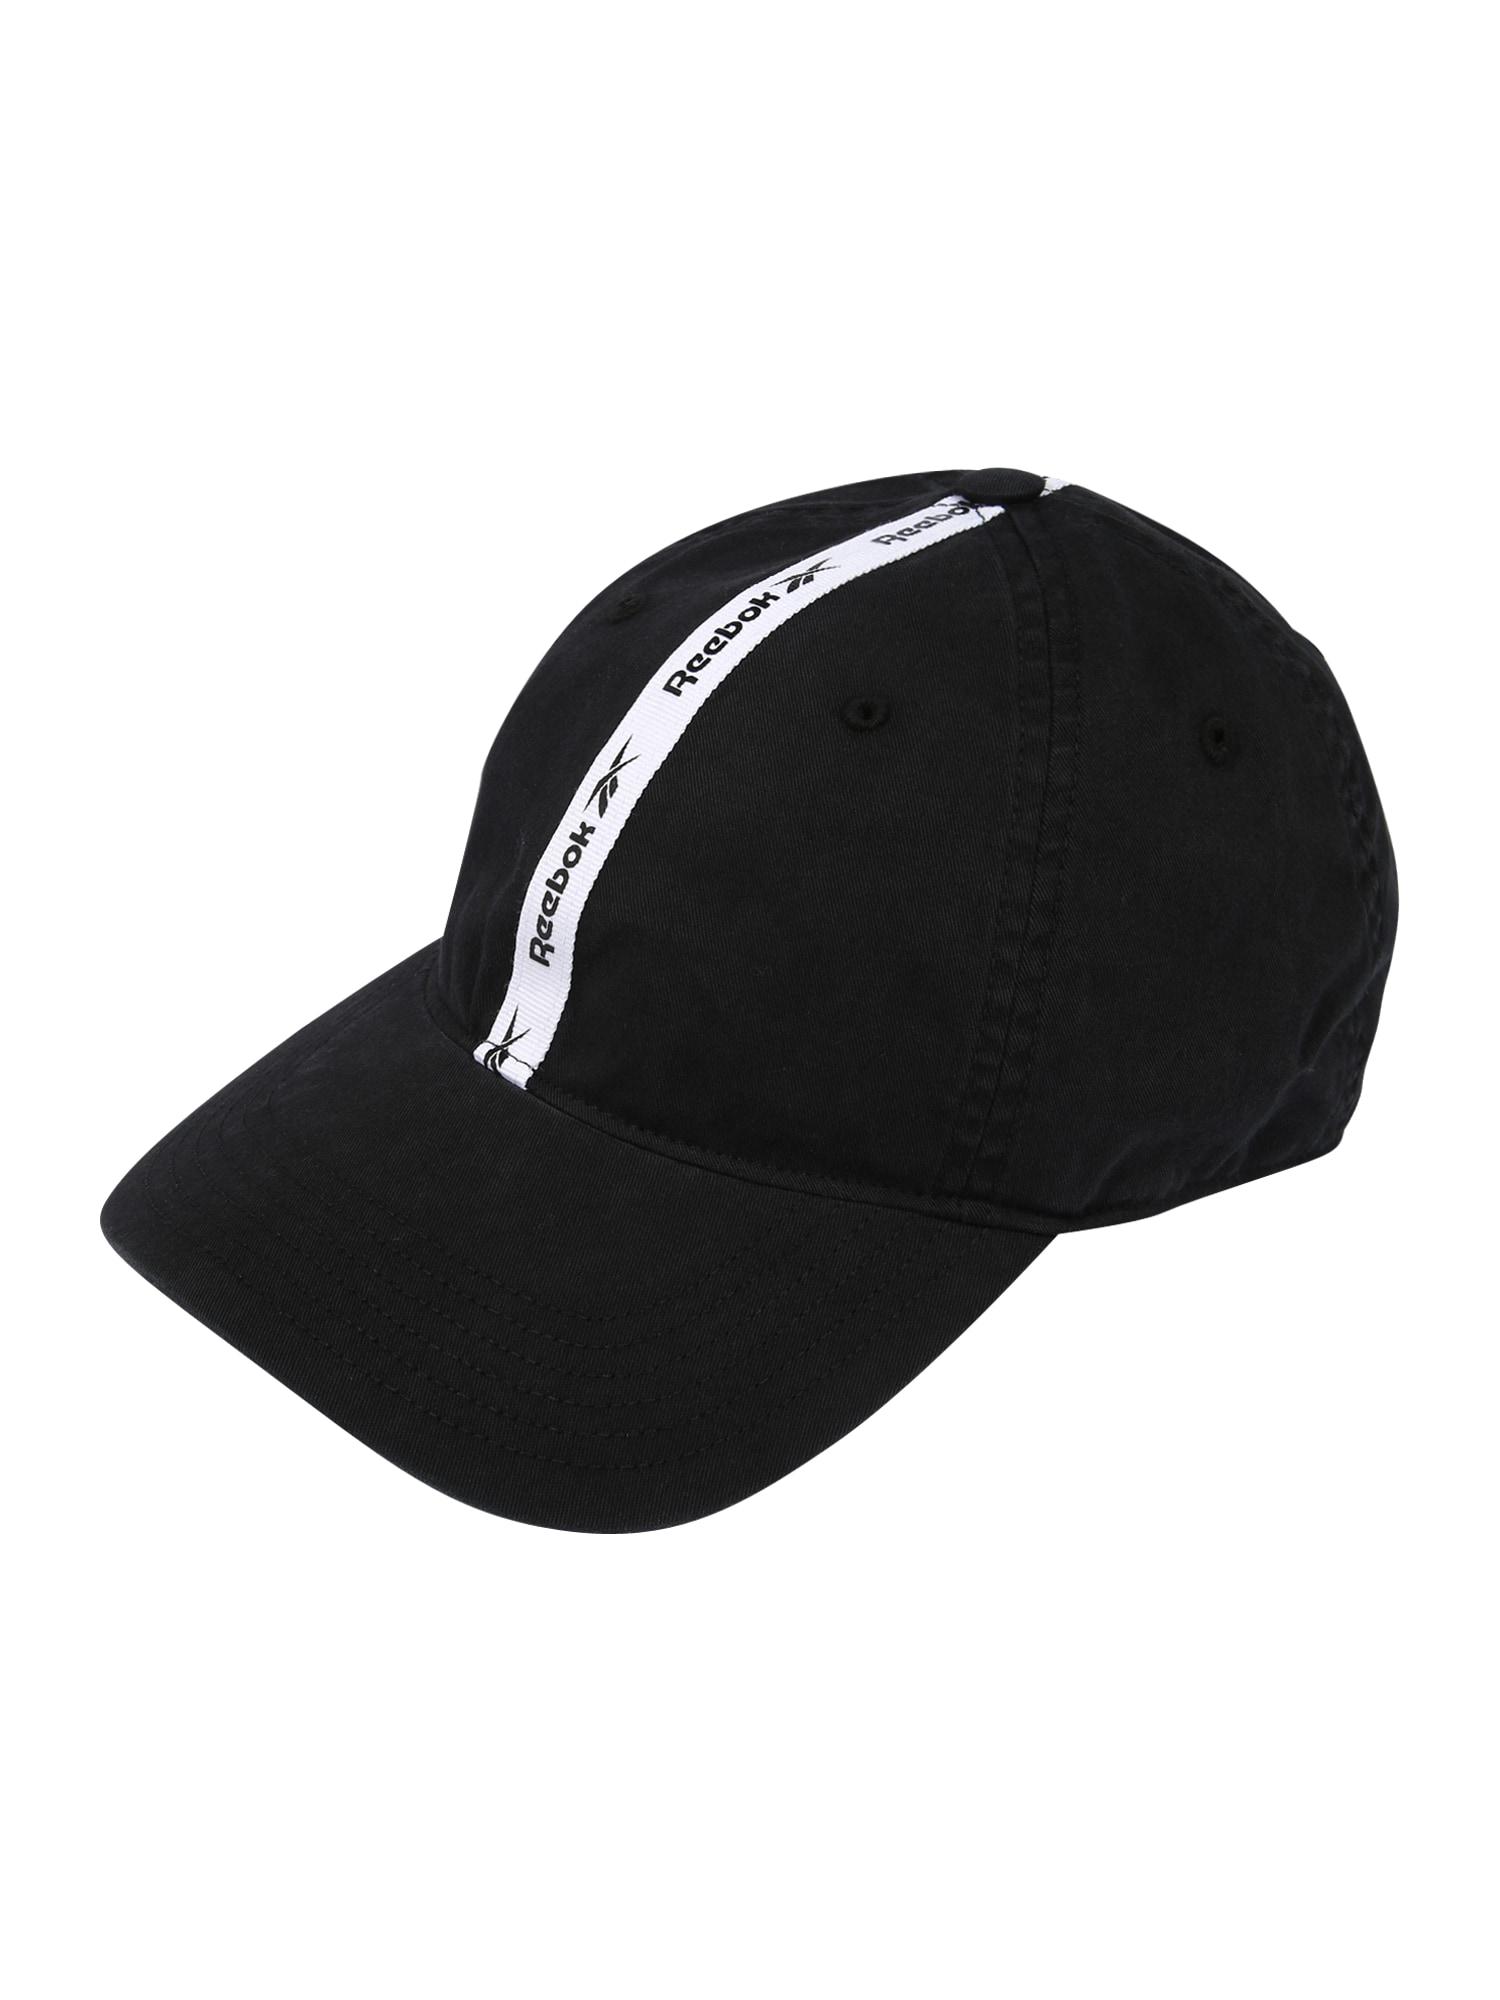 Reebok Classic Kepurė juoda / balta